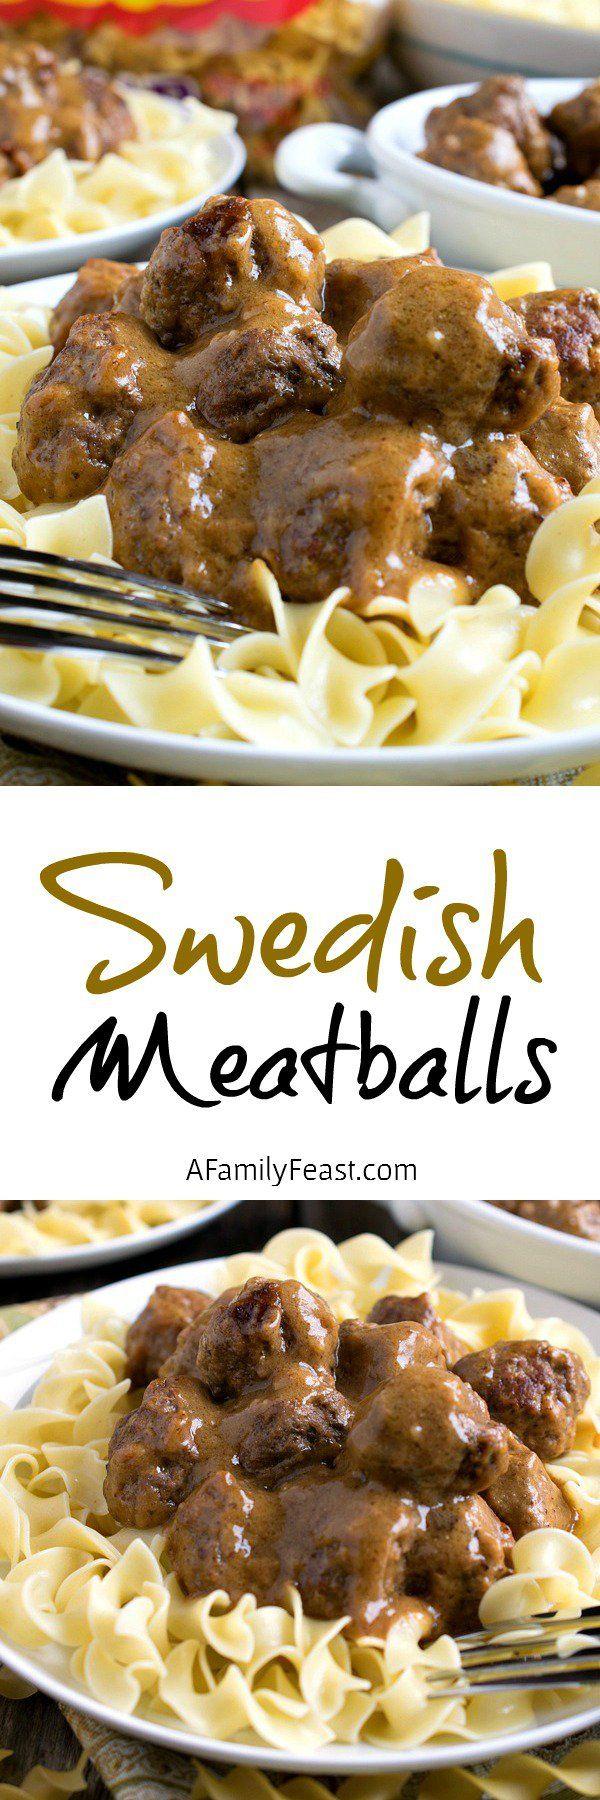 Swedish Meatballs over Noodles